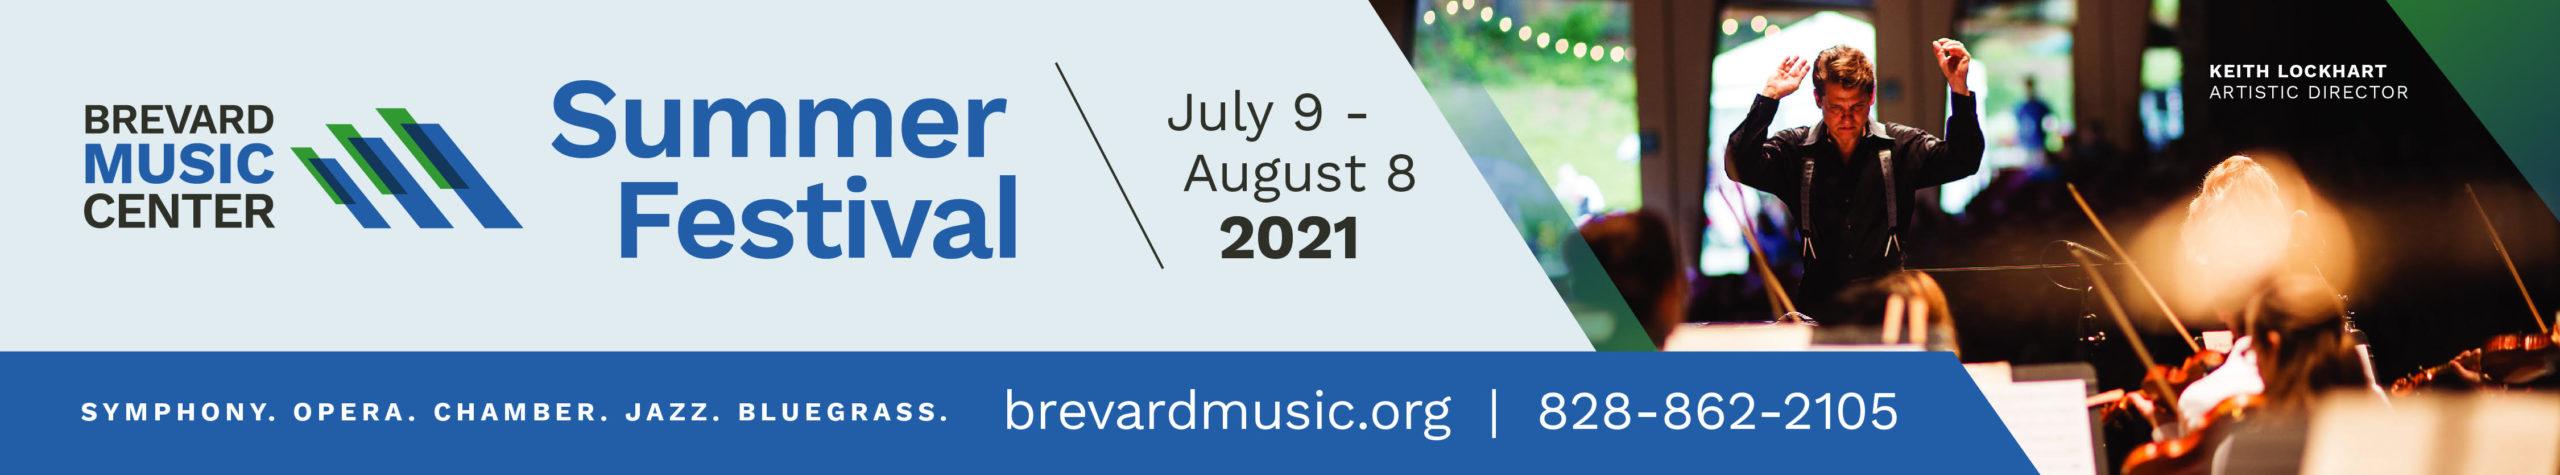 Brevard Music Center Summer Festival July Ninth Thru August Eighth